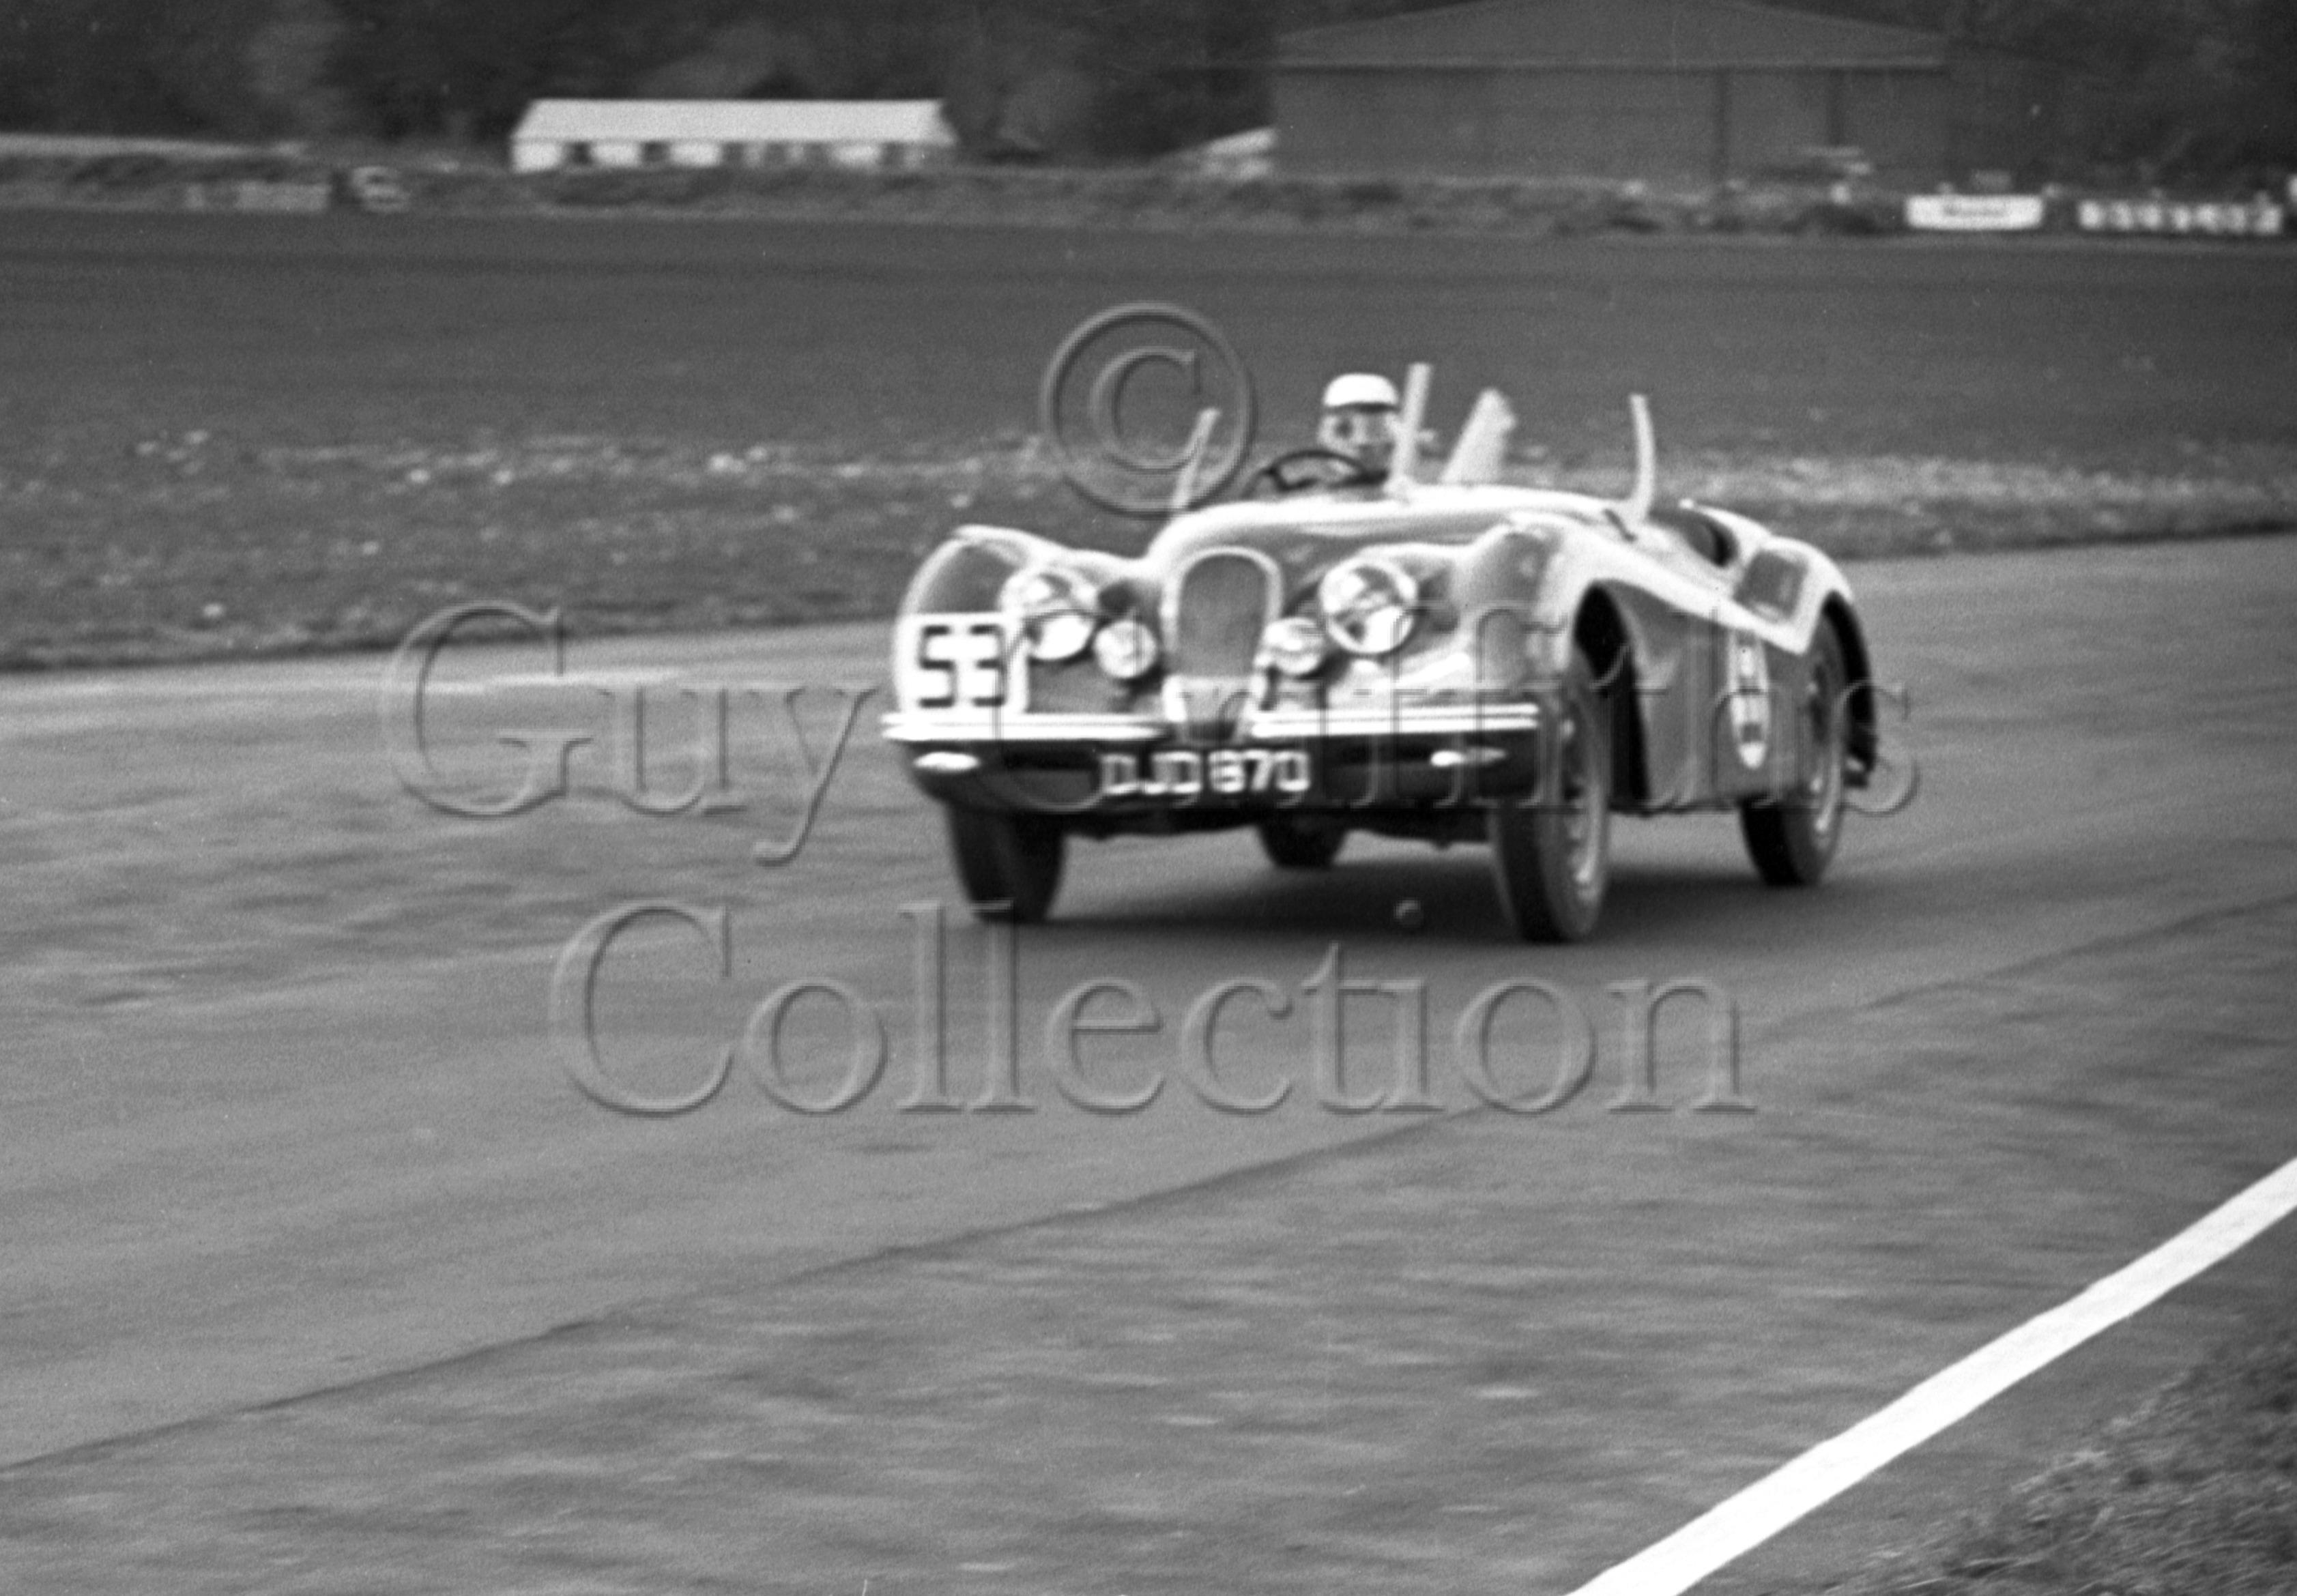 39-521–J-Rockman–Jaguar-DJD-870–Goodwood–26-03-1951.jpg - Guy Griffiths Collection